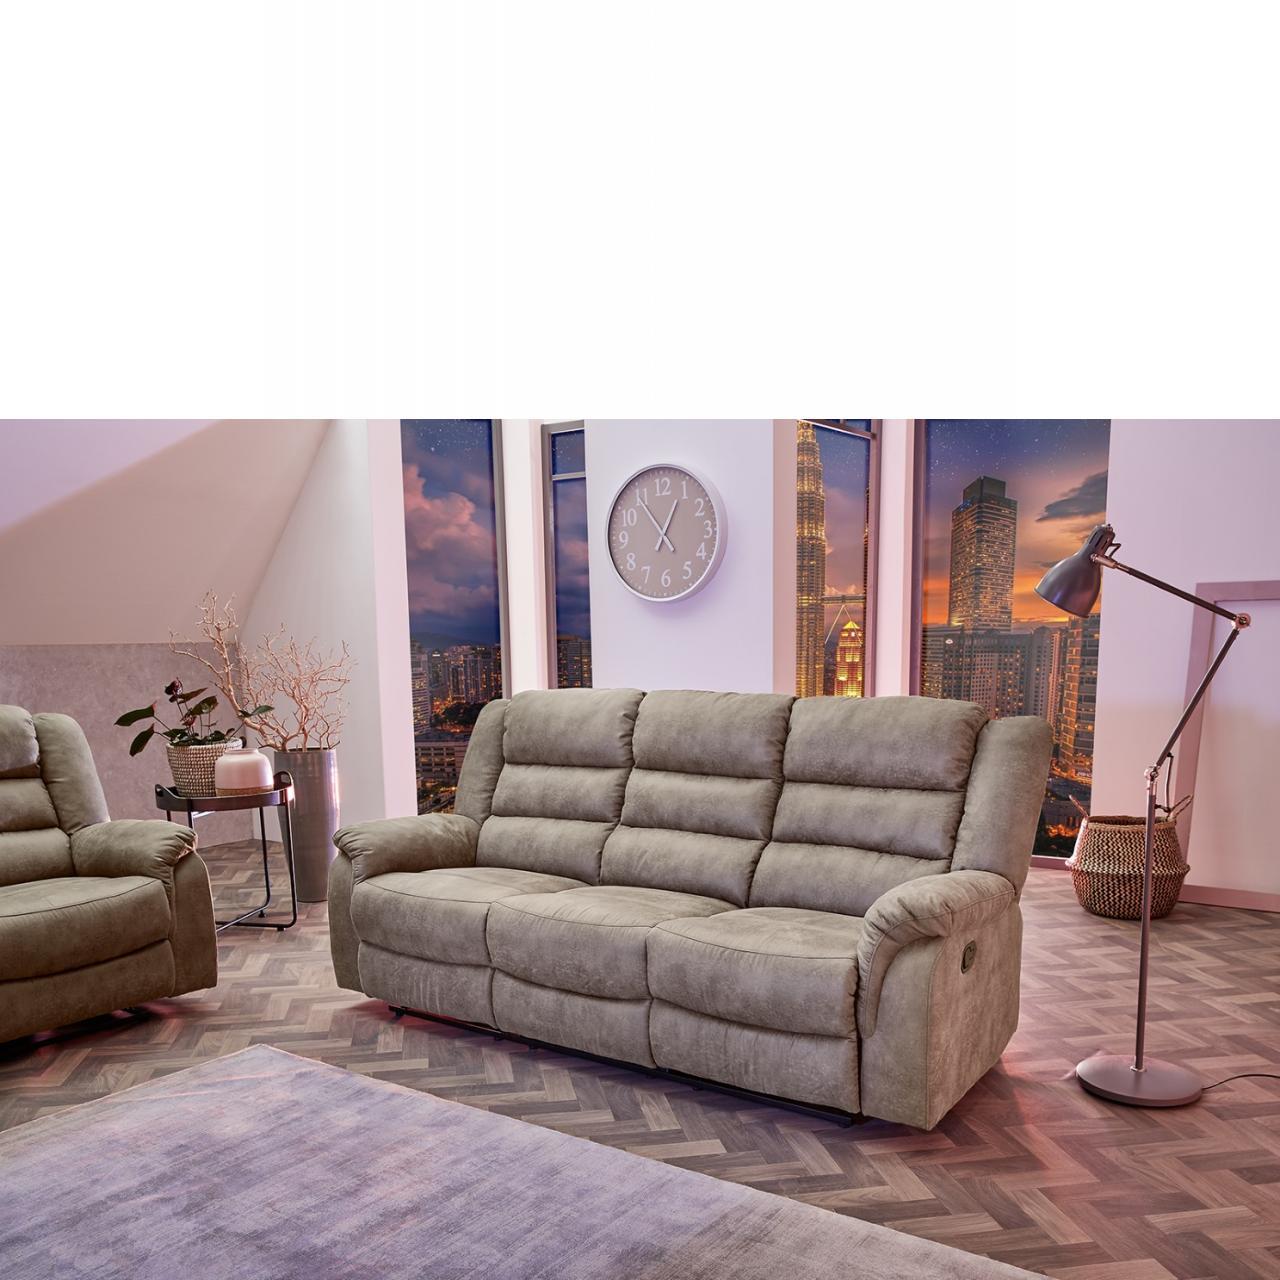 Full Size of Couch Grau 2 Und 3 Sitzer Sofa 3 Sitzer Nino Schwarz/grau Retro Kingsley Leder Ikea Louisiana (3 Sitzer Mit Polster Grau) Schlaffunktion Samt 3er Cleveland In Sofa Sofa 3 Sitzer Grau